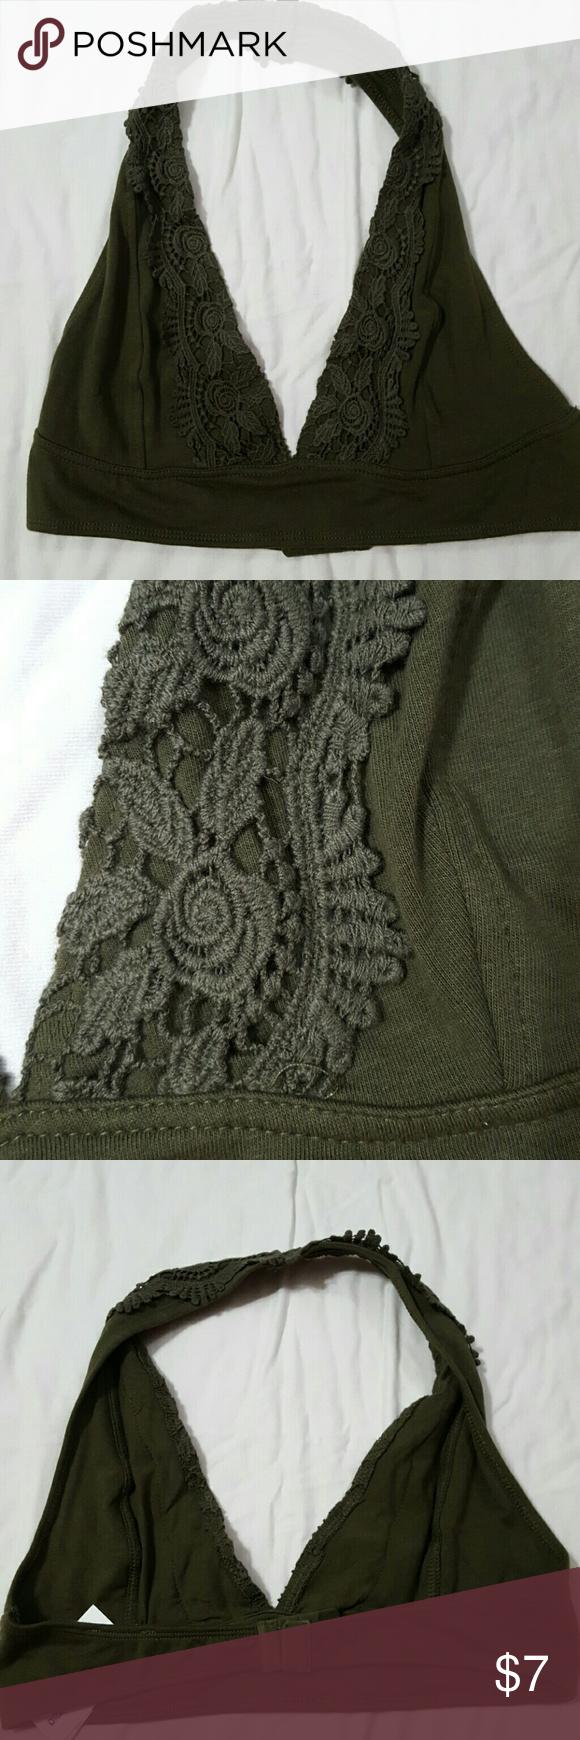 Green lace halter bralette Green lace halter bralette. Adjustable back bra strap. timing Intimates & Sleepwear Bras